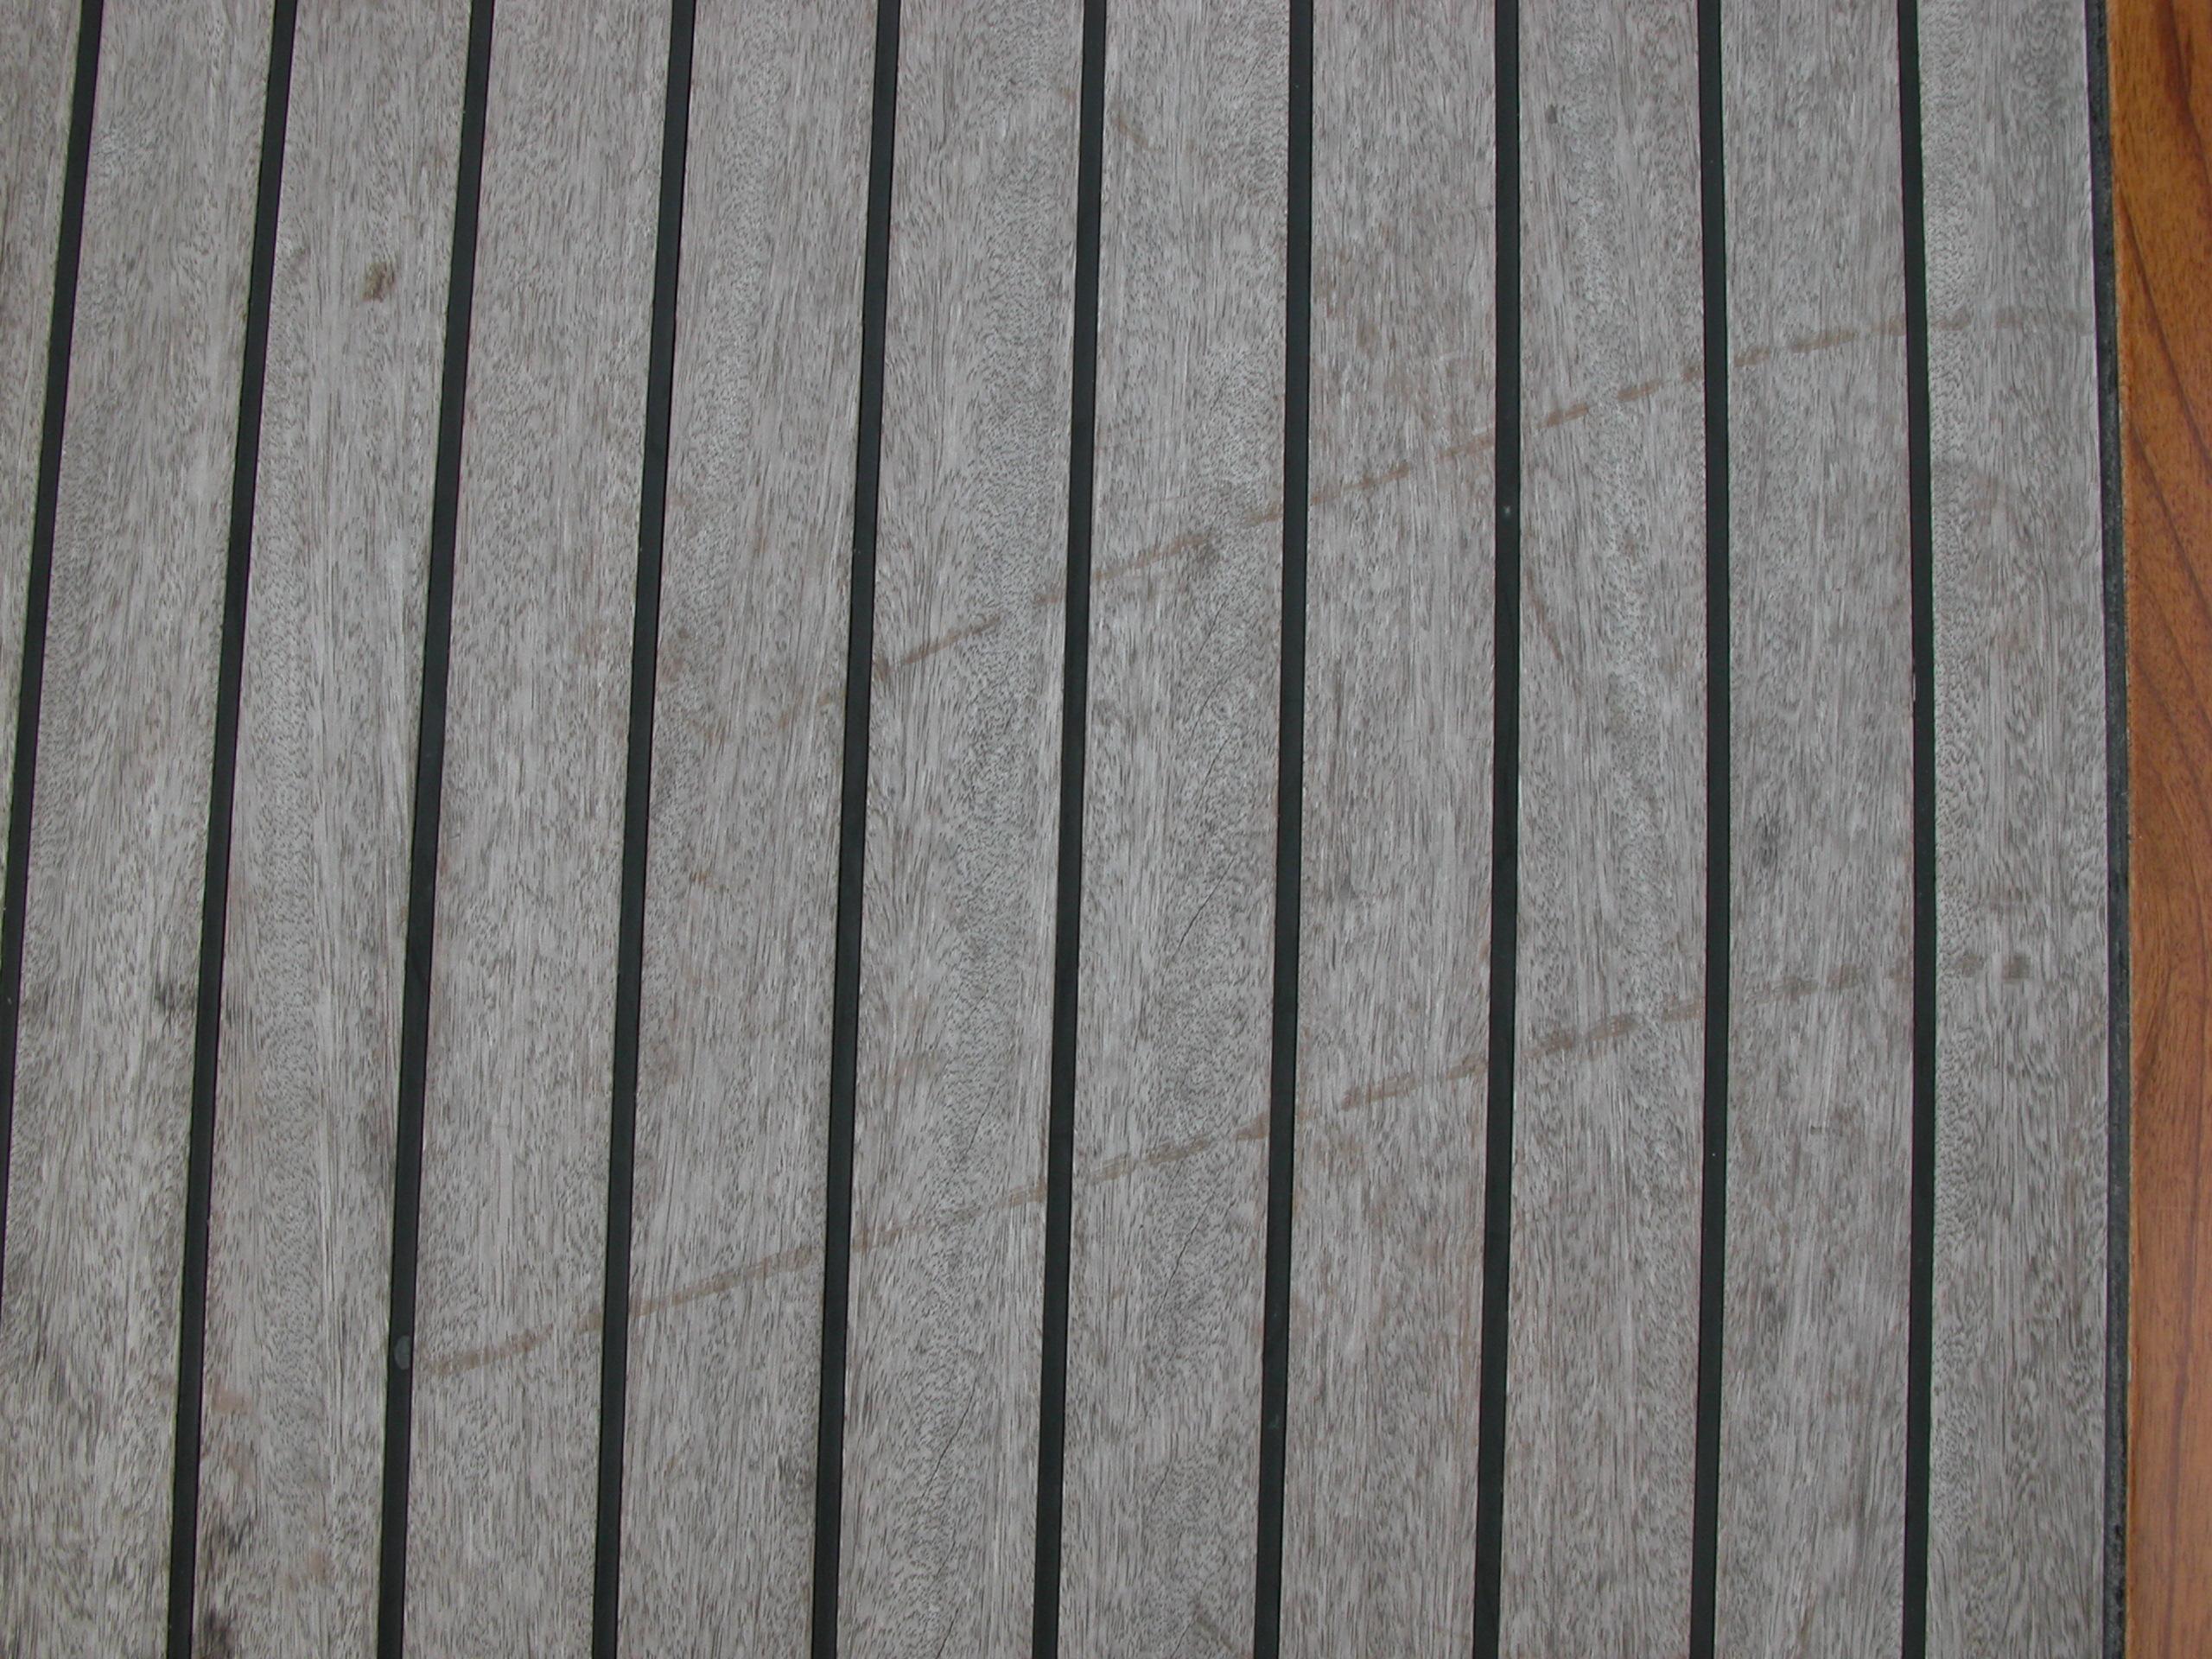 Teak Wooden Flooring Texture : Image*After : photos : wood texture teak floor ship